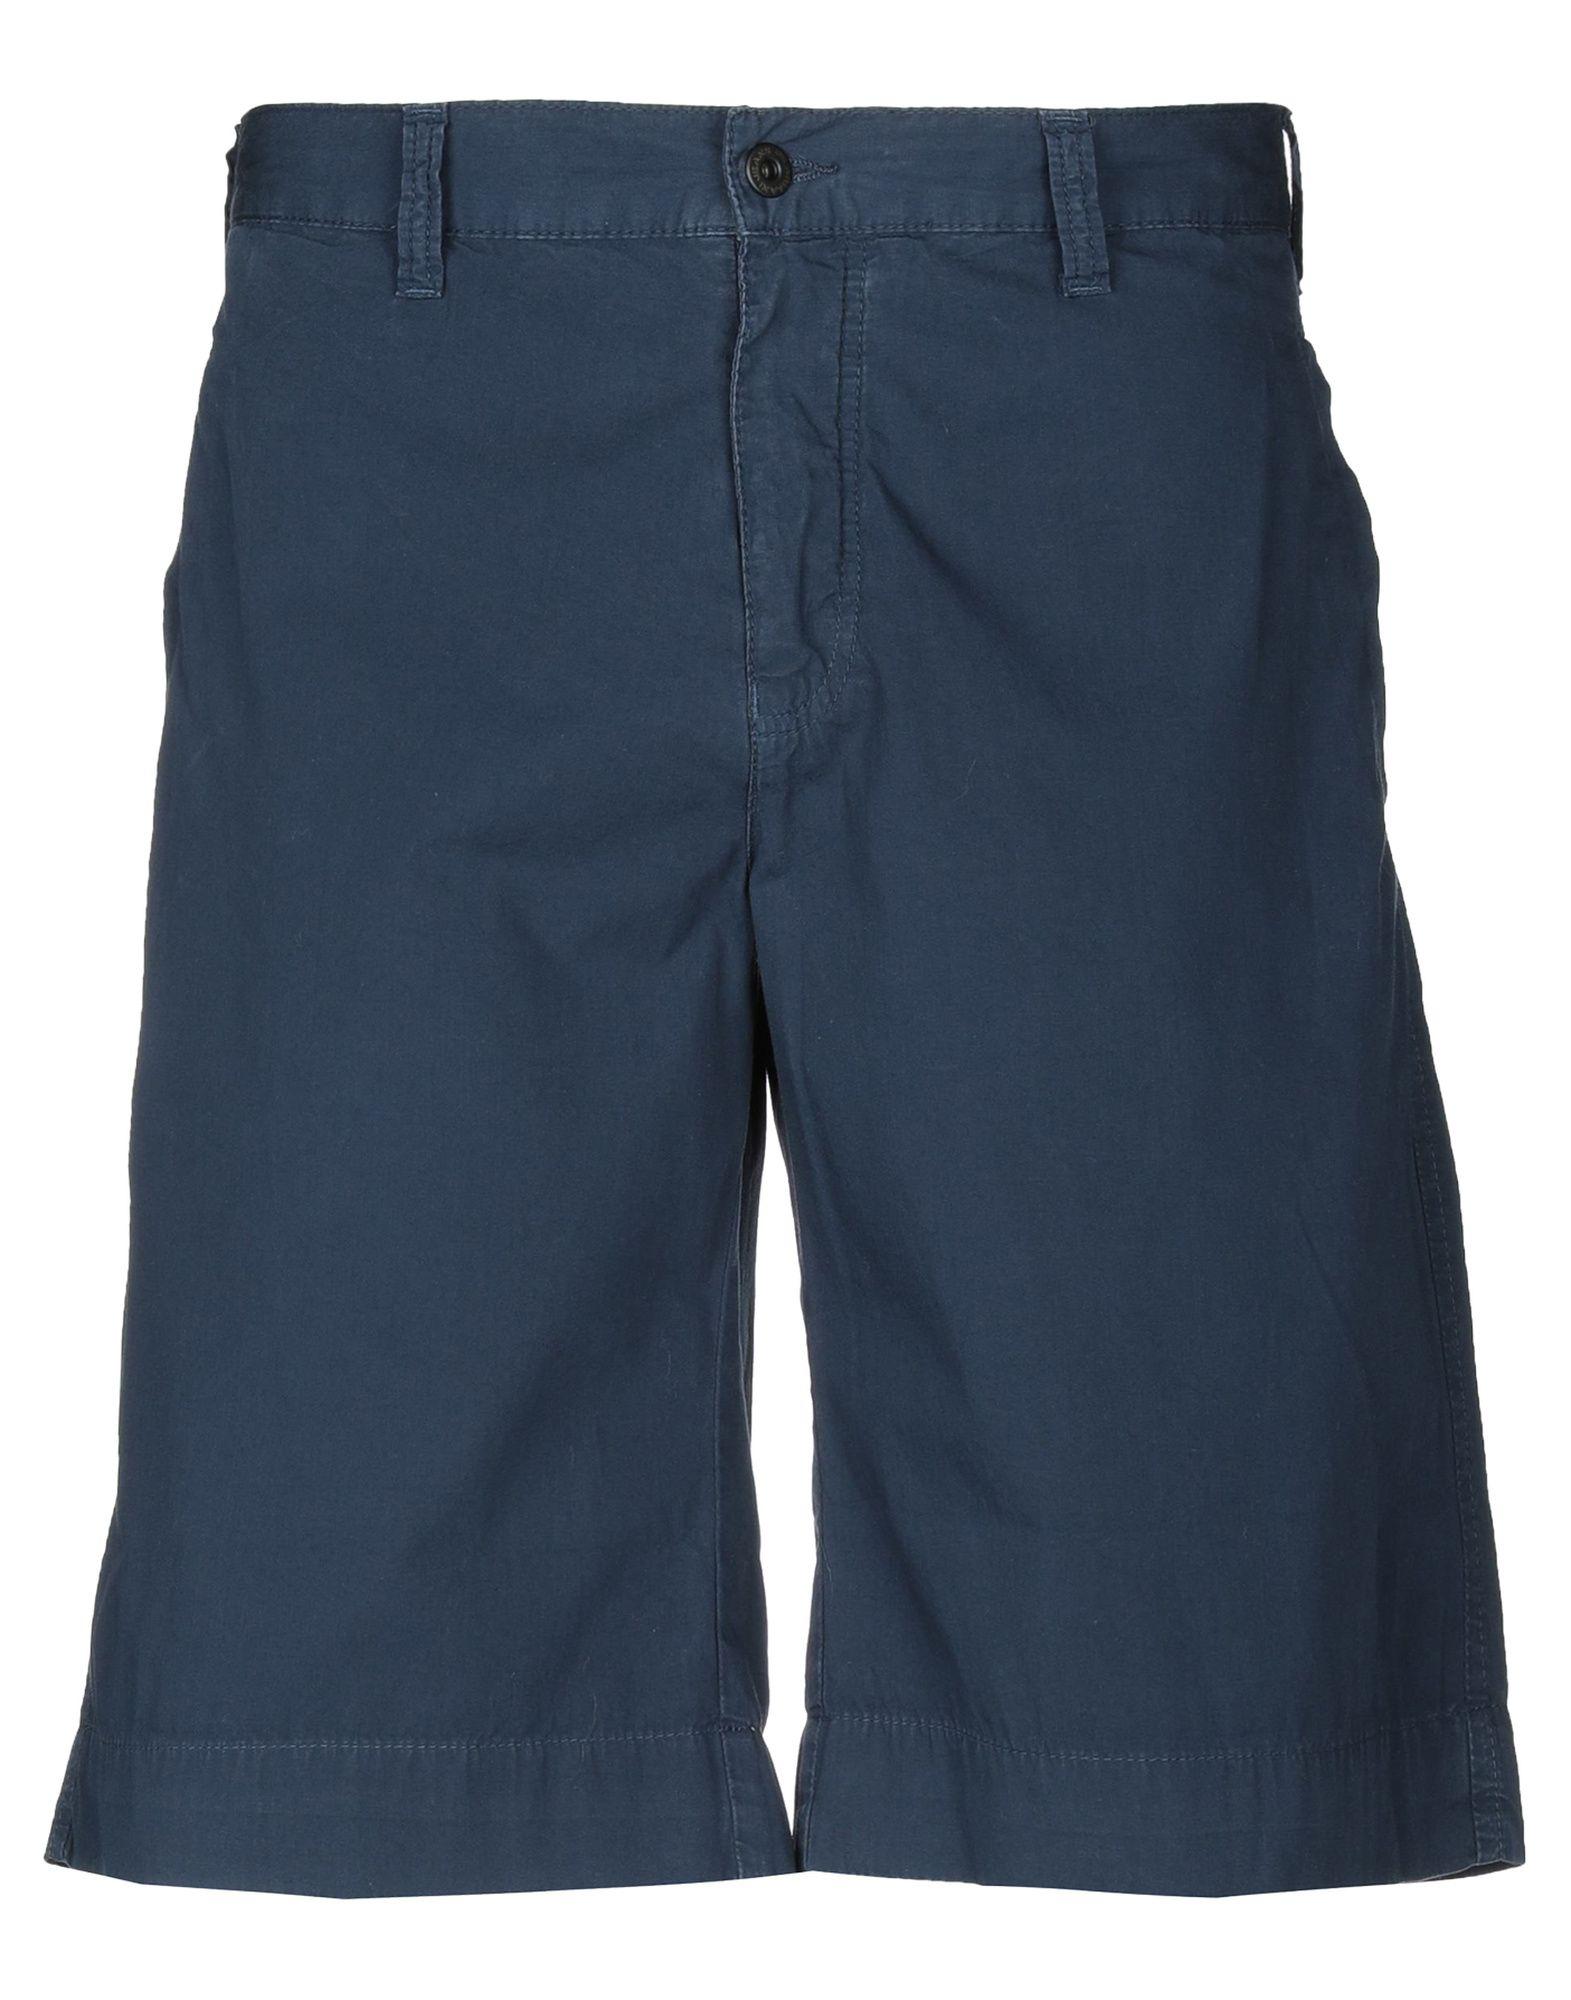 ARMANI JEANS Бермуды armani jeans джинсовые бермуды